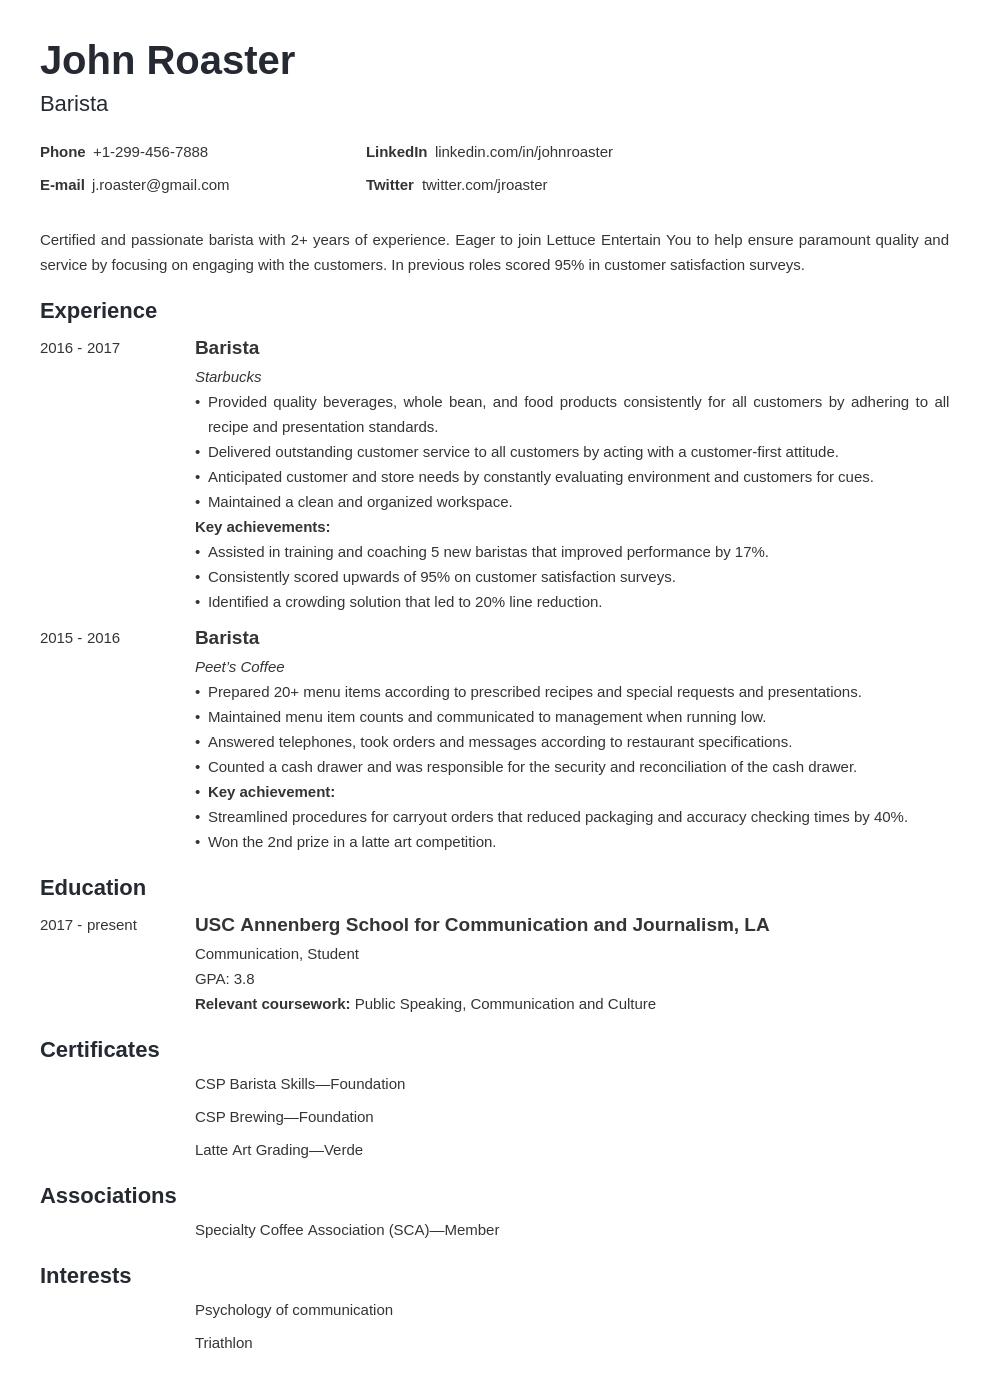 resume interests template minimo 1612450747